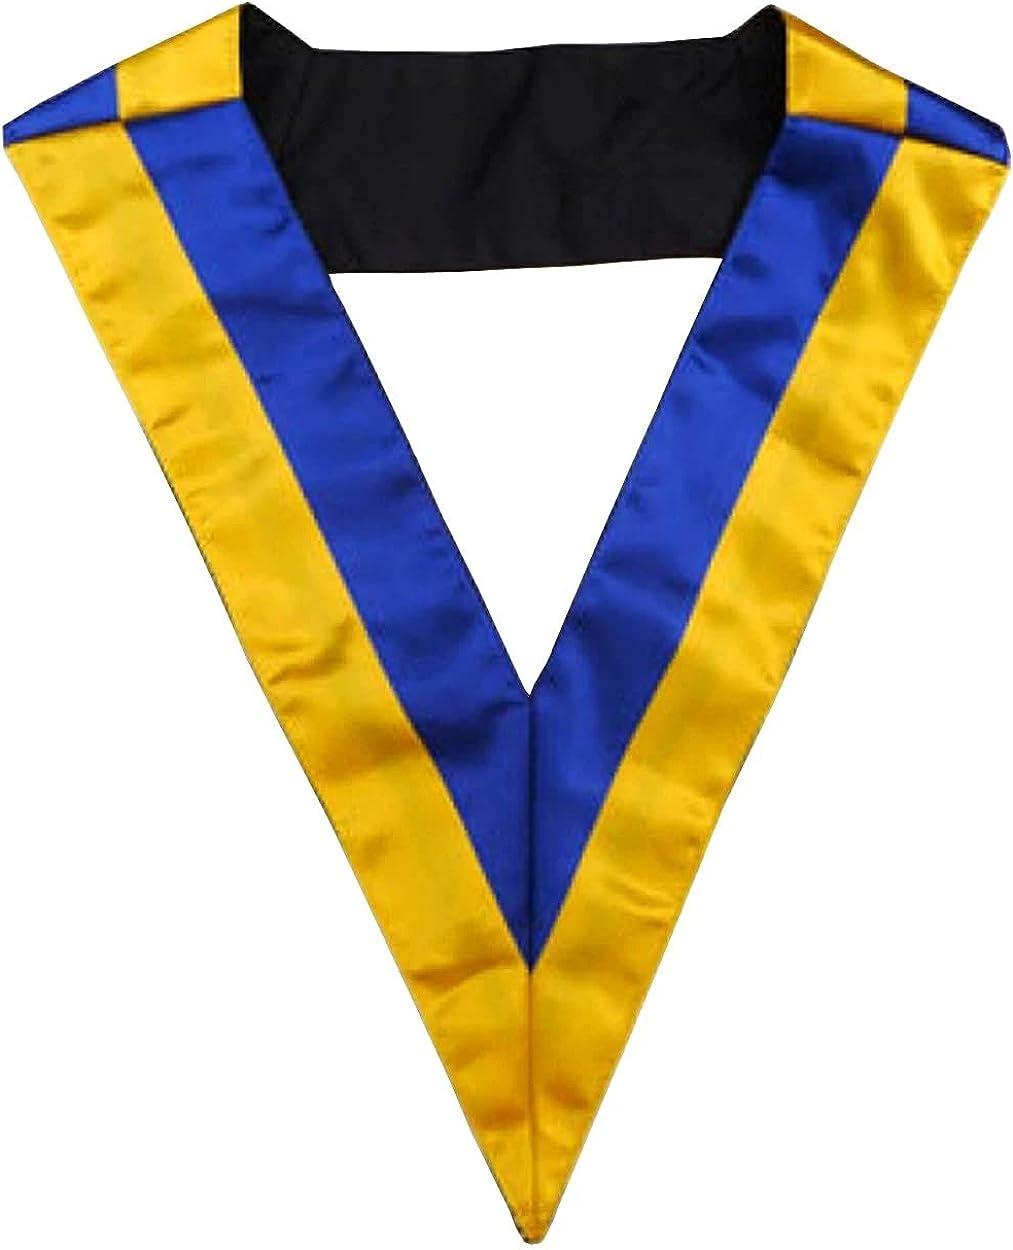 Masonic Officer's collar - ASSR - 20th degree